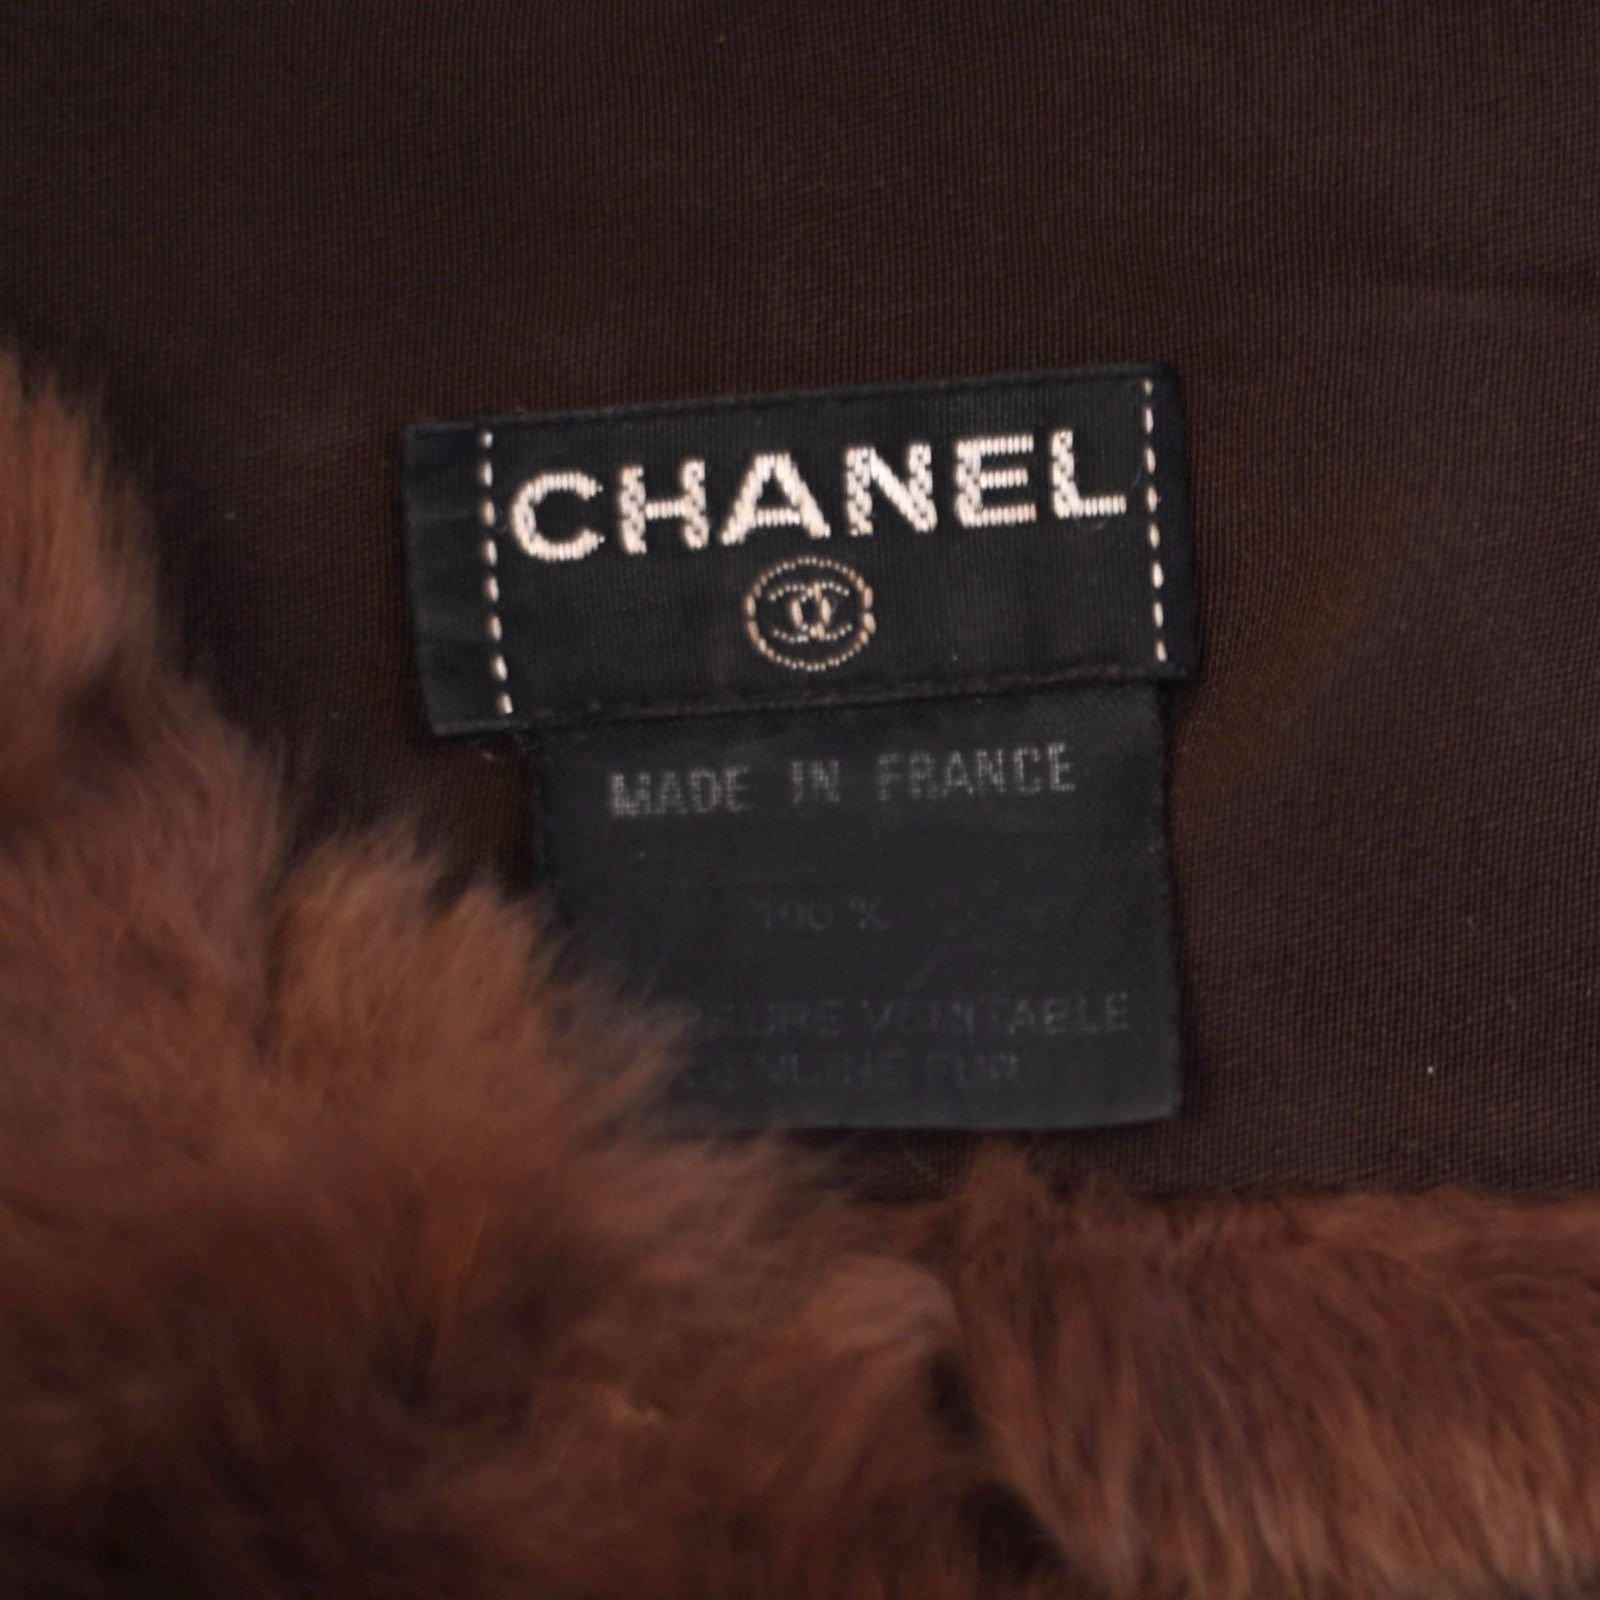 Foulards Chanel écharpe matelassée en fourrure Fourrure Marron ref.37181 -  Joli Closet 71447f93ece